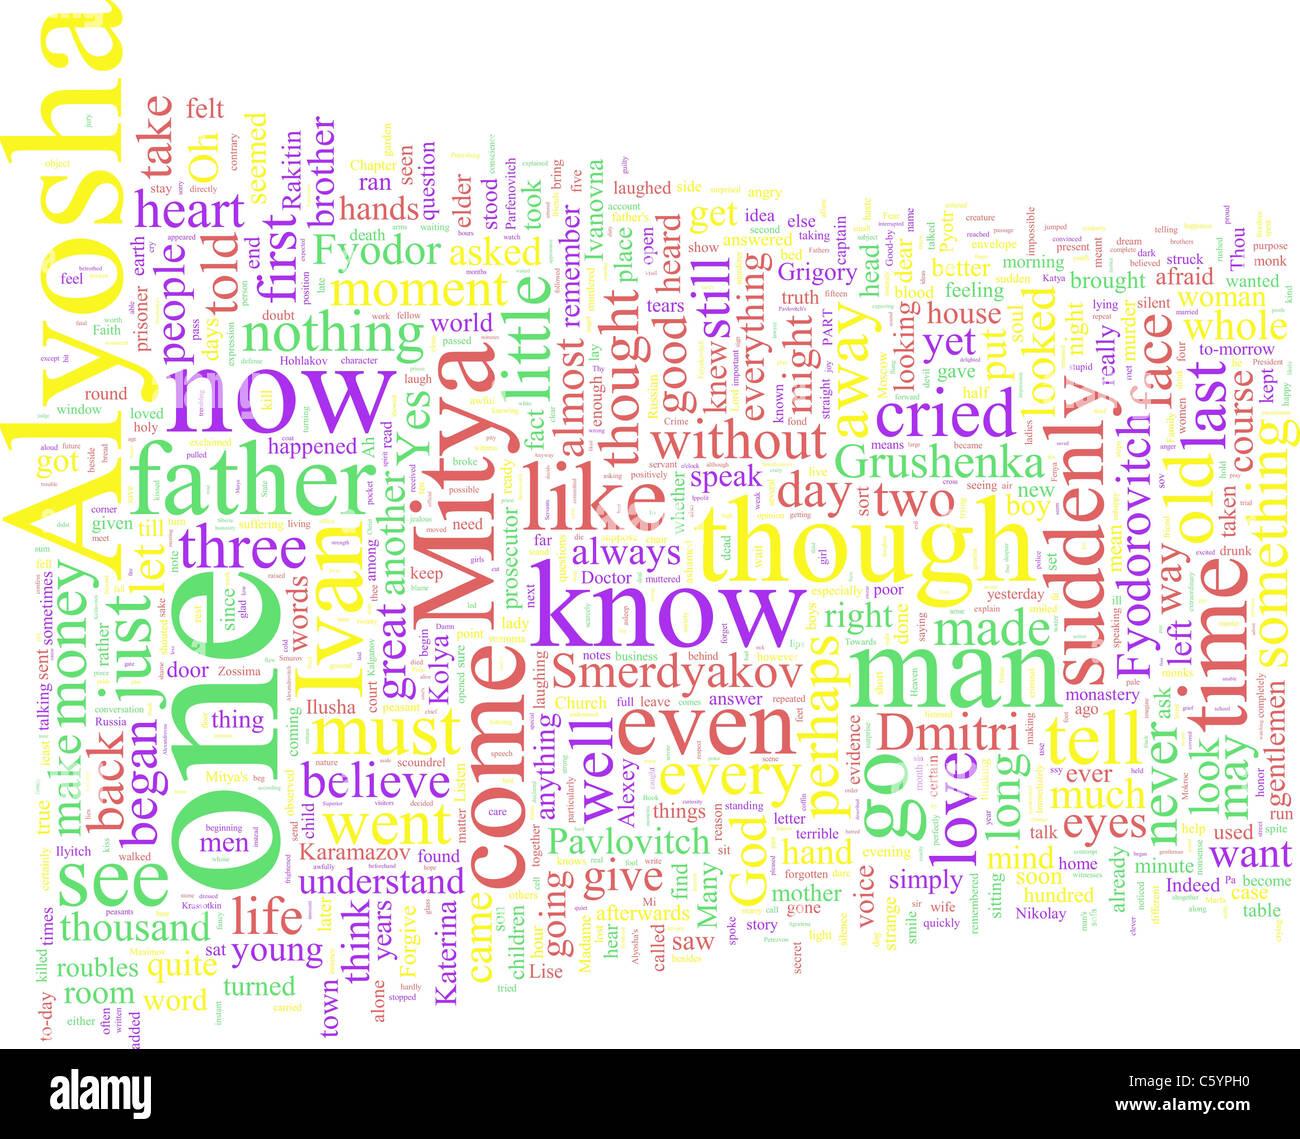 Word Cloud Based on Dostoewsky's Brothers Karamazov - Stock Image